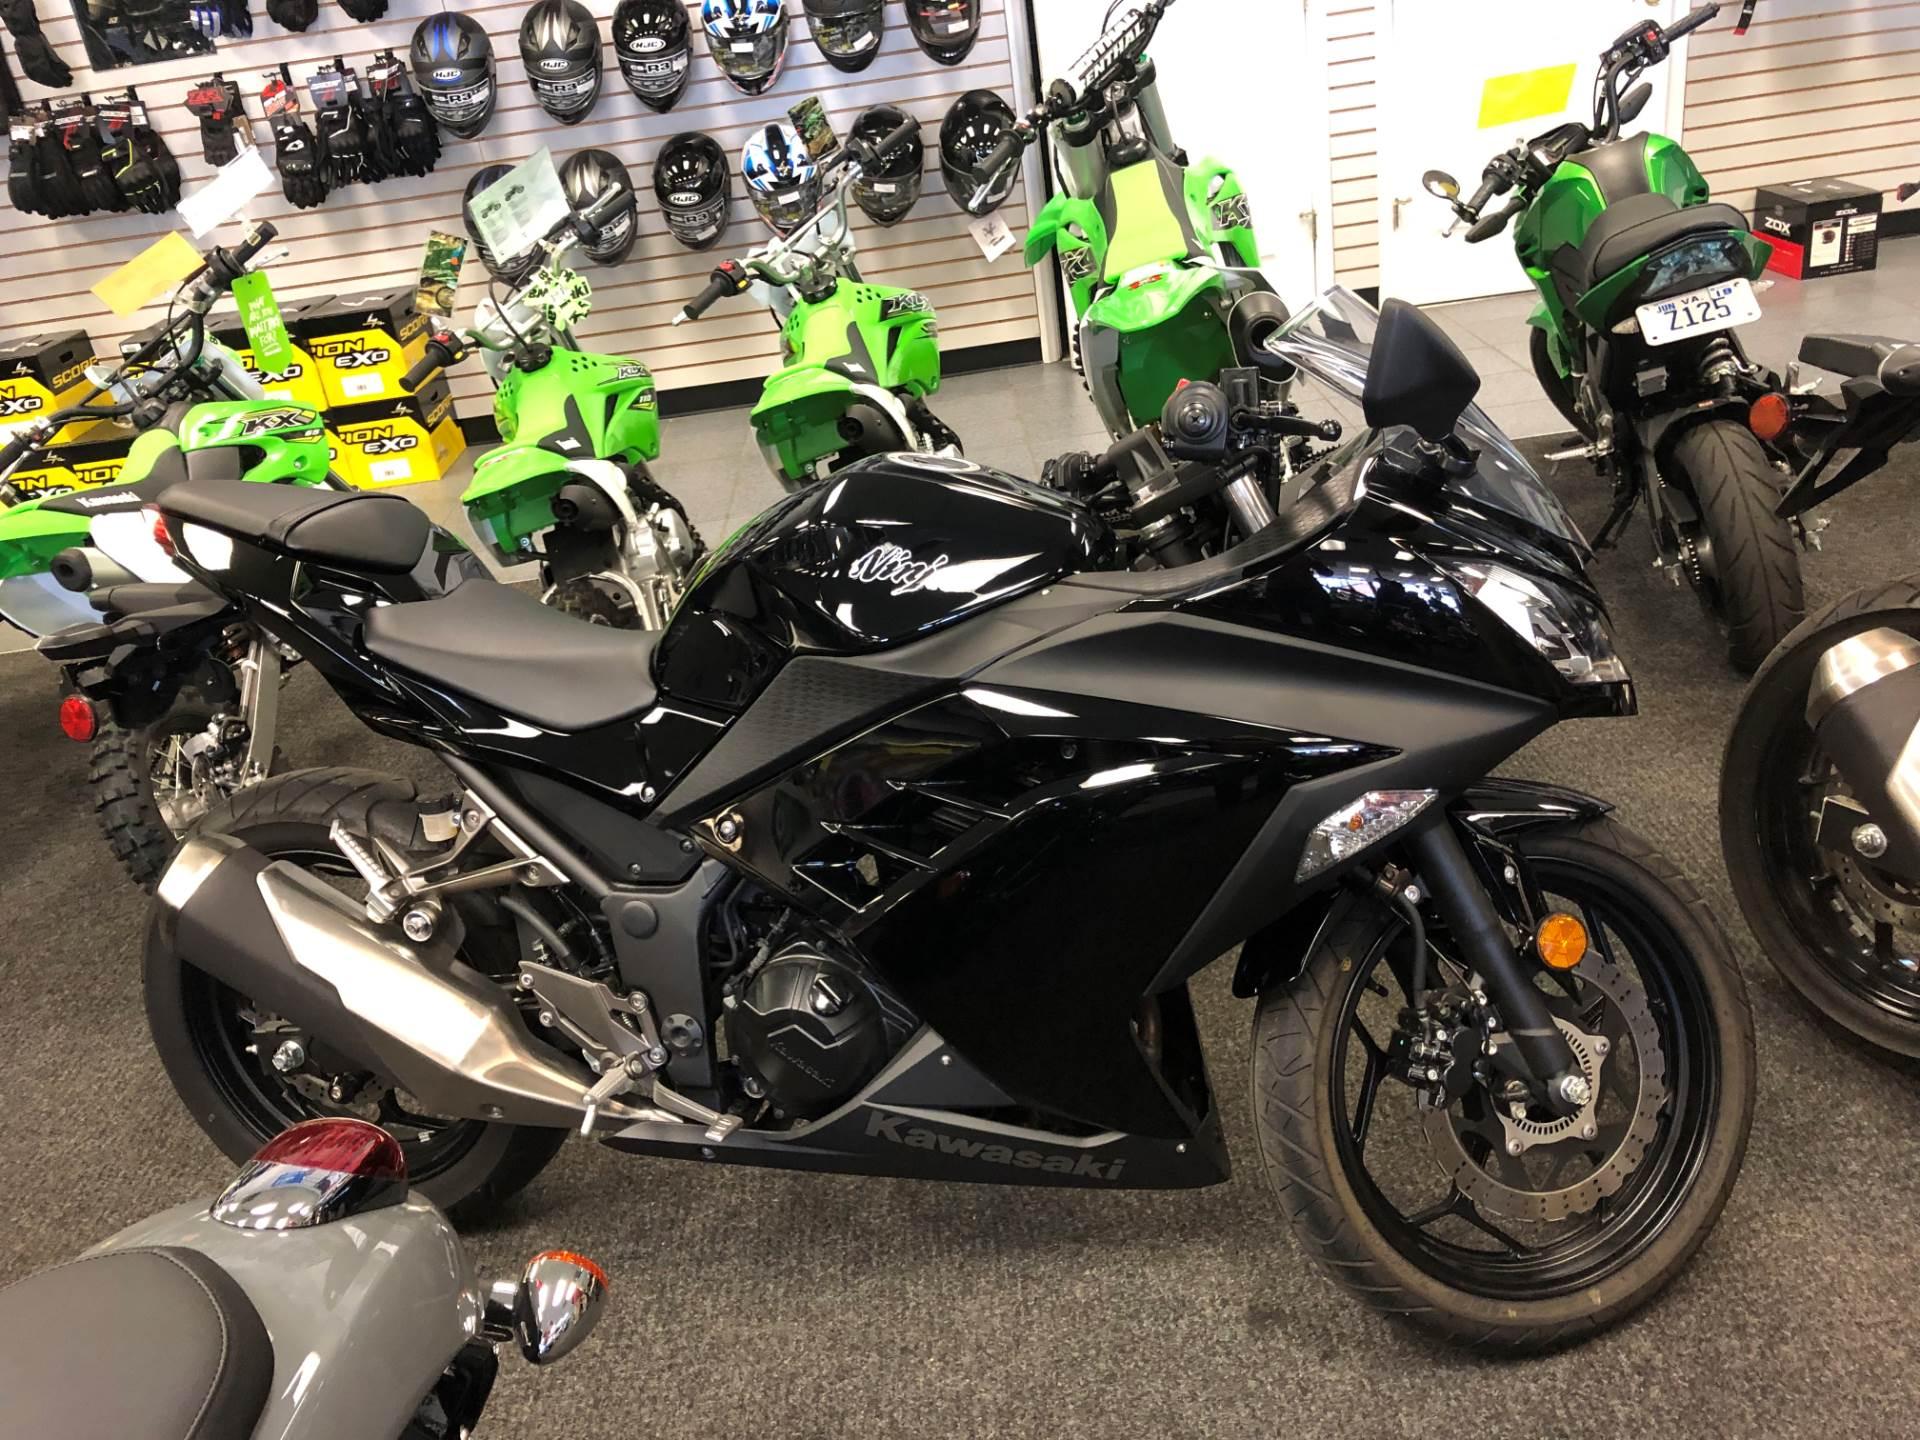 Used 2014 Kawasaki Ninja 300 Abs Motorcycles In Highland Springs